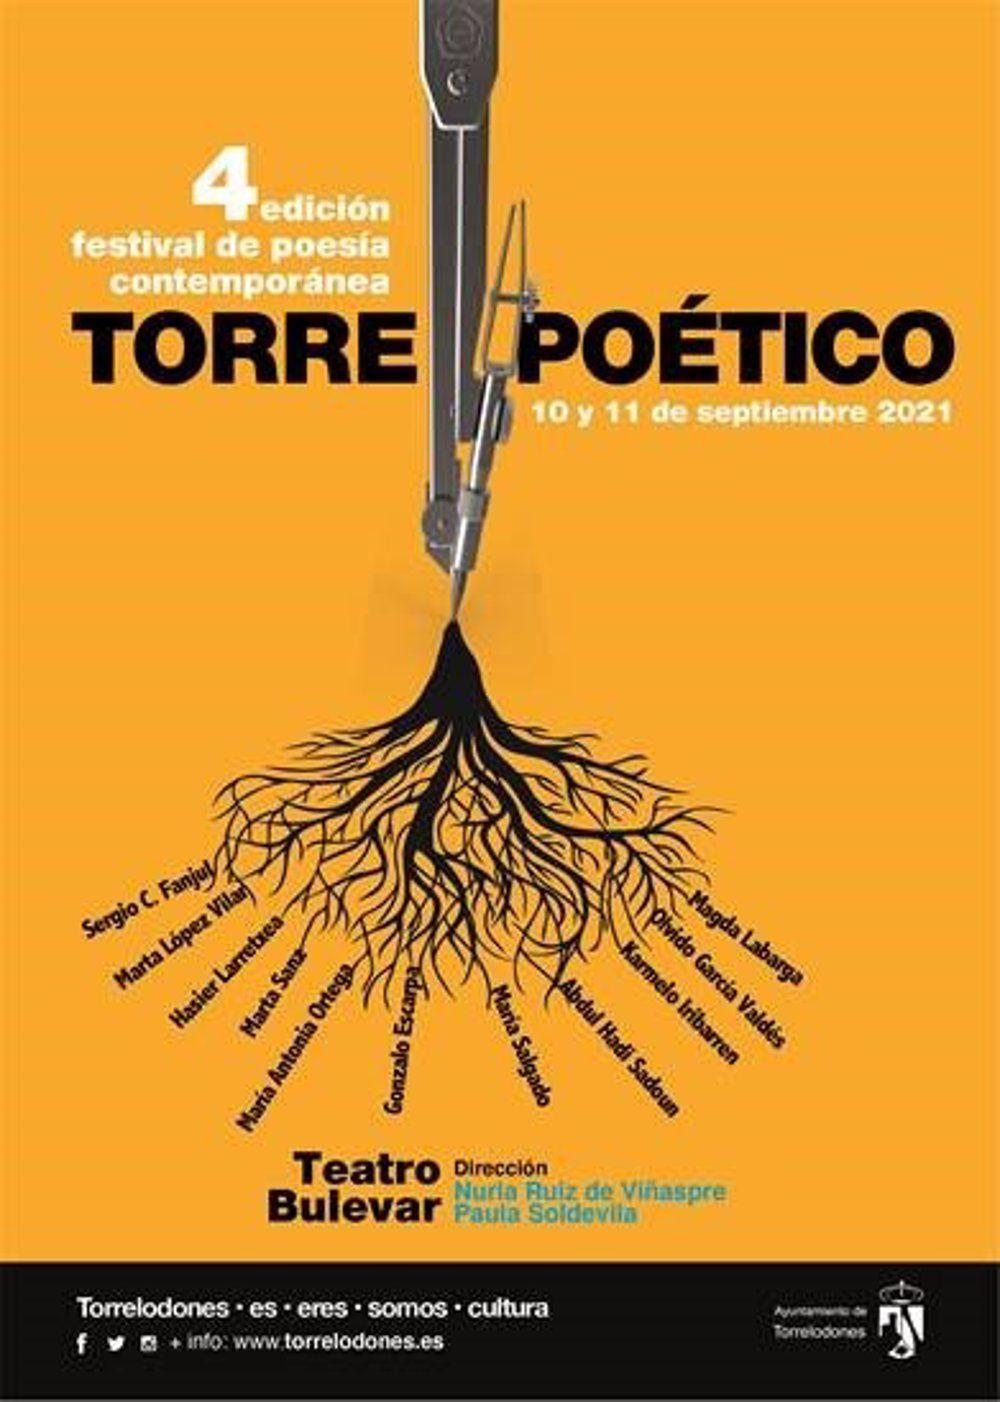 Festival Torrepoético de Torrelodones